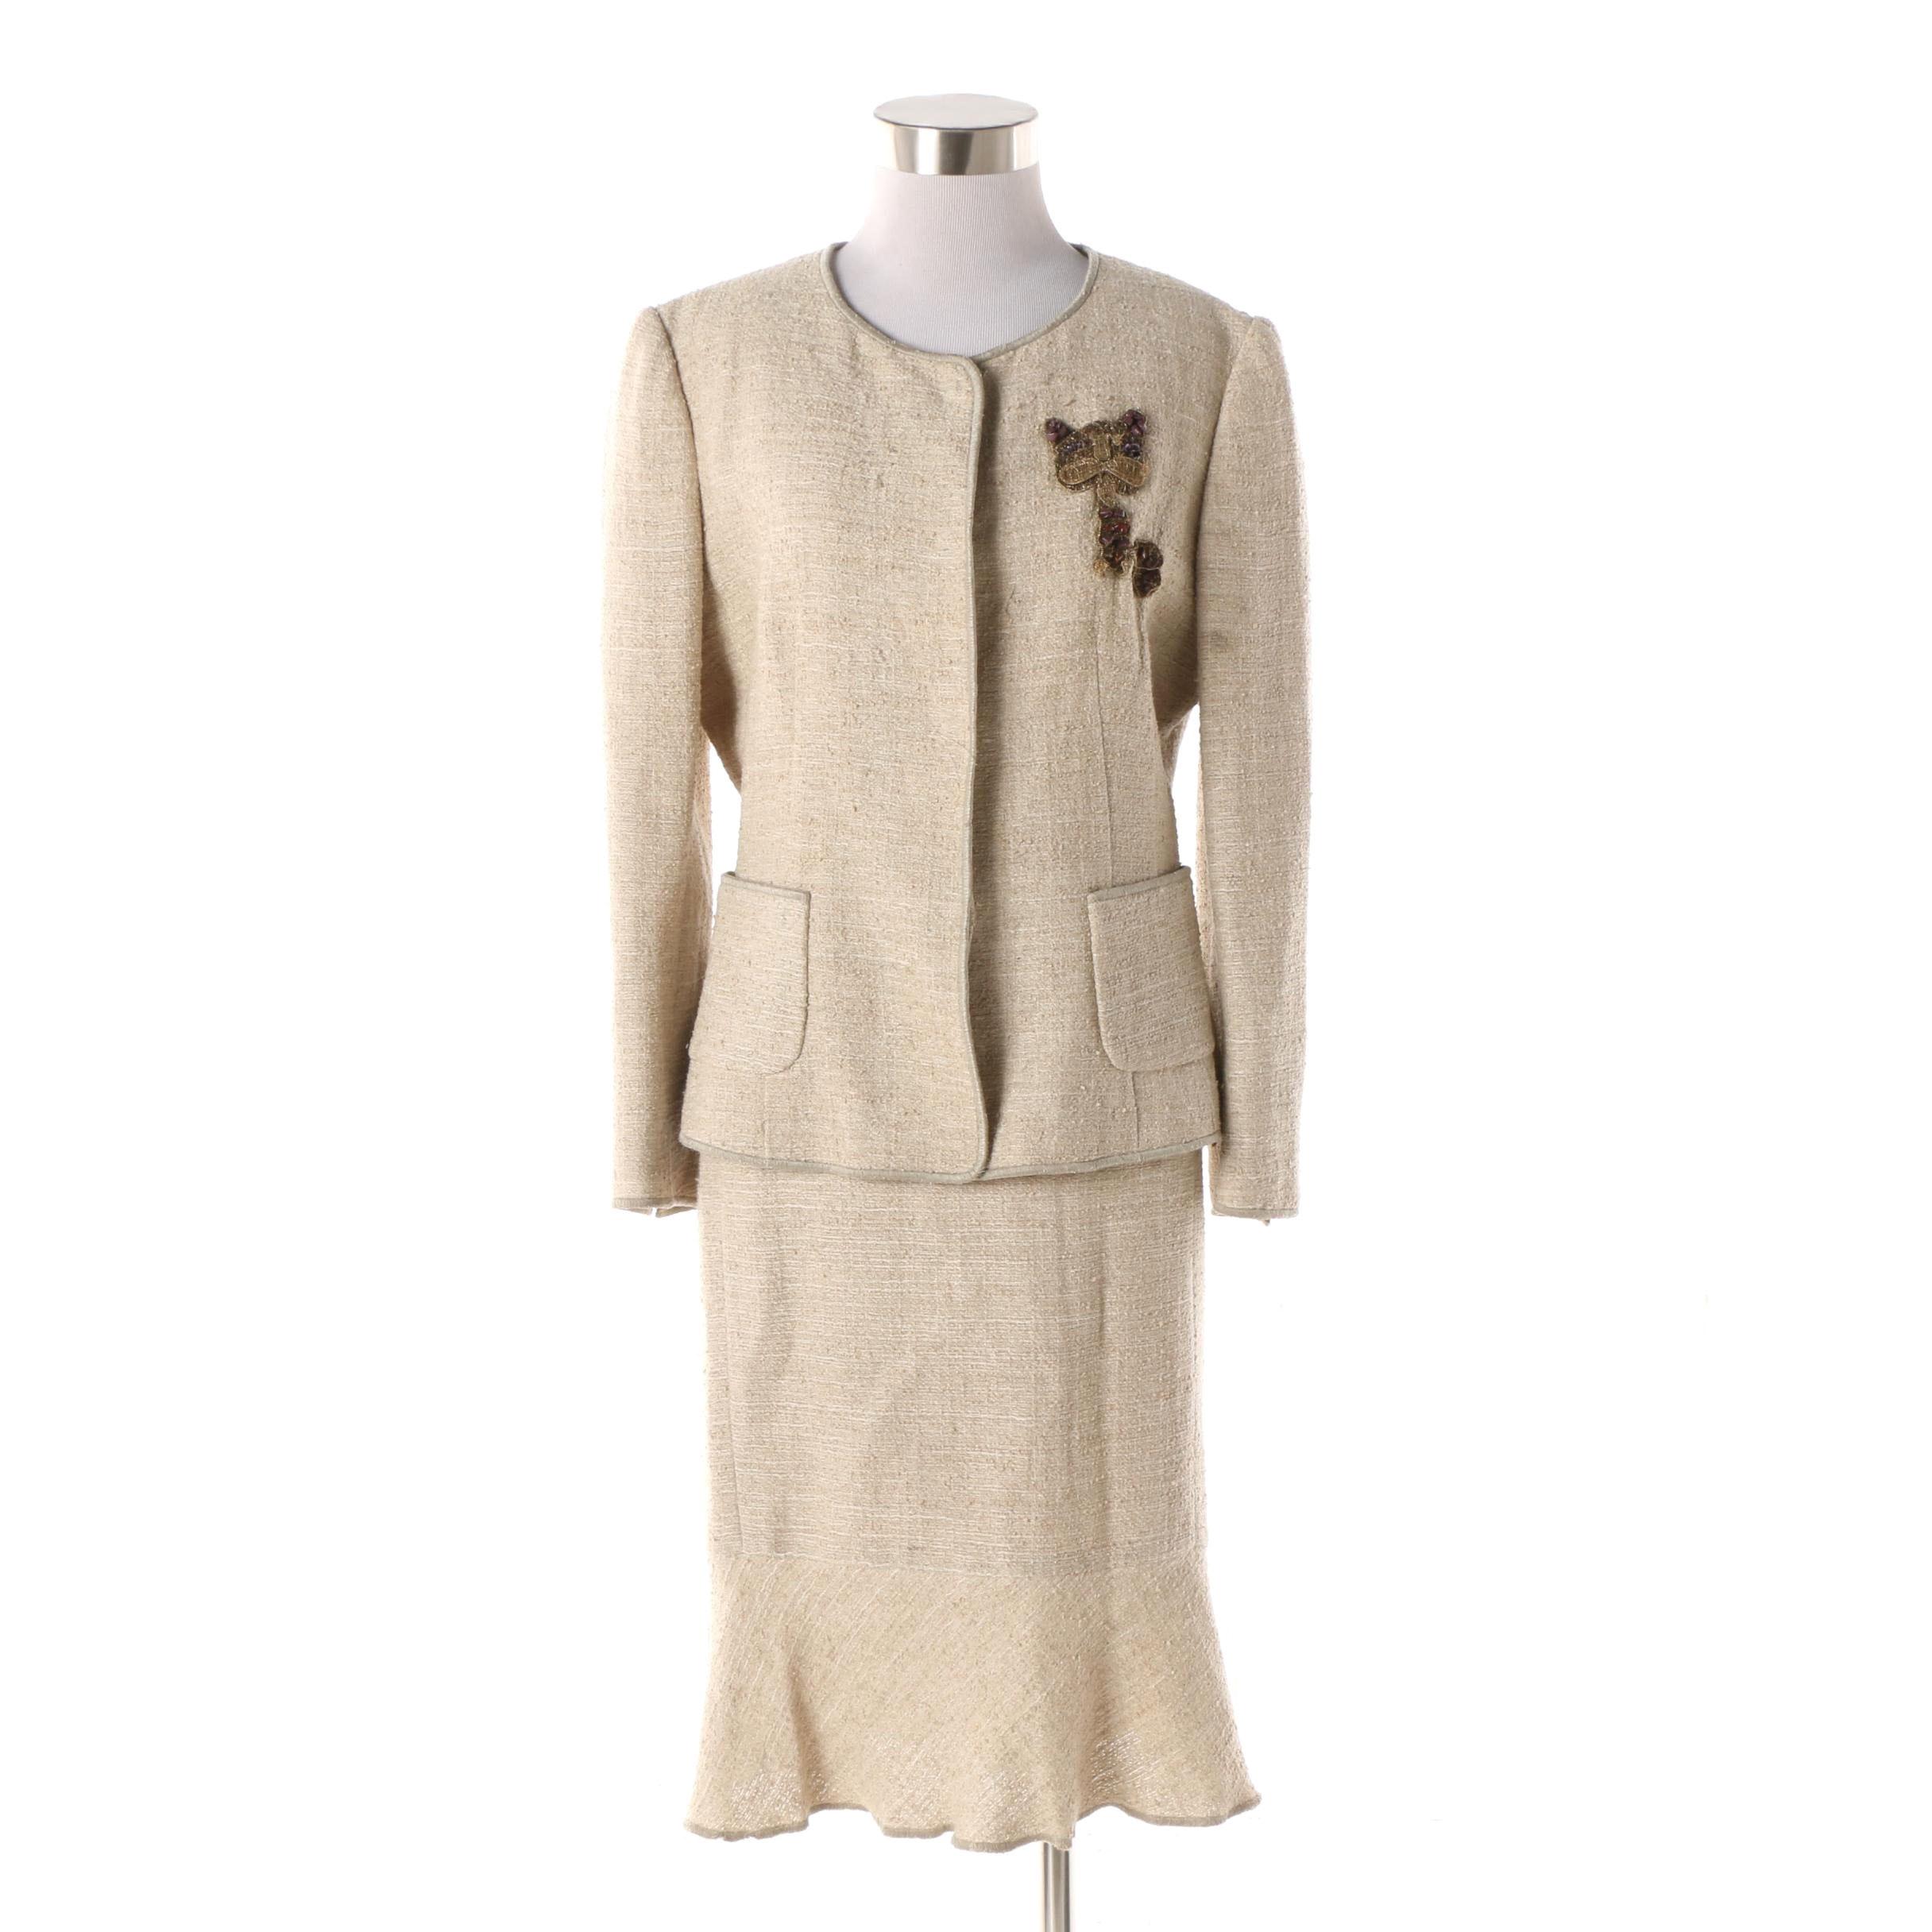 Moschino Linen Blend Skirt Suit with Cat Appliqué